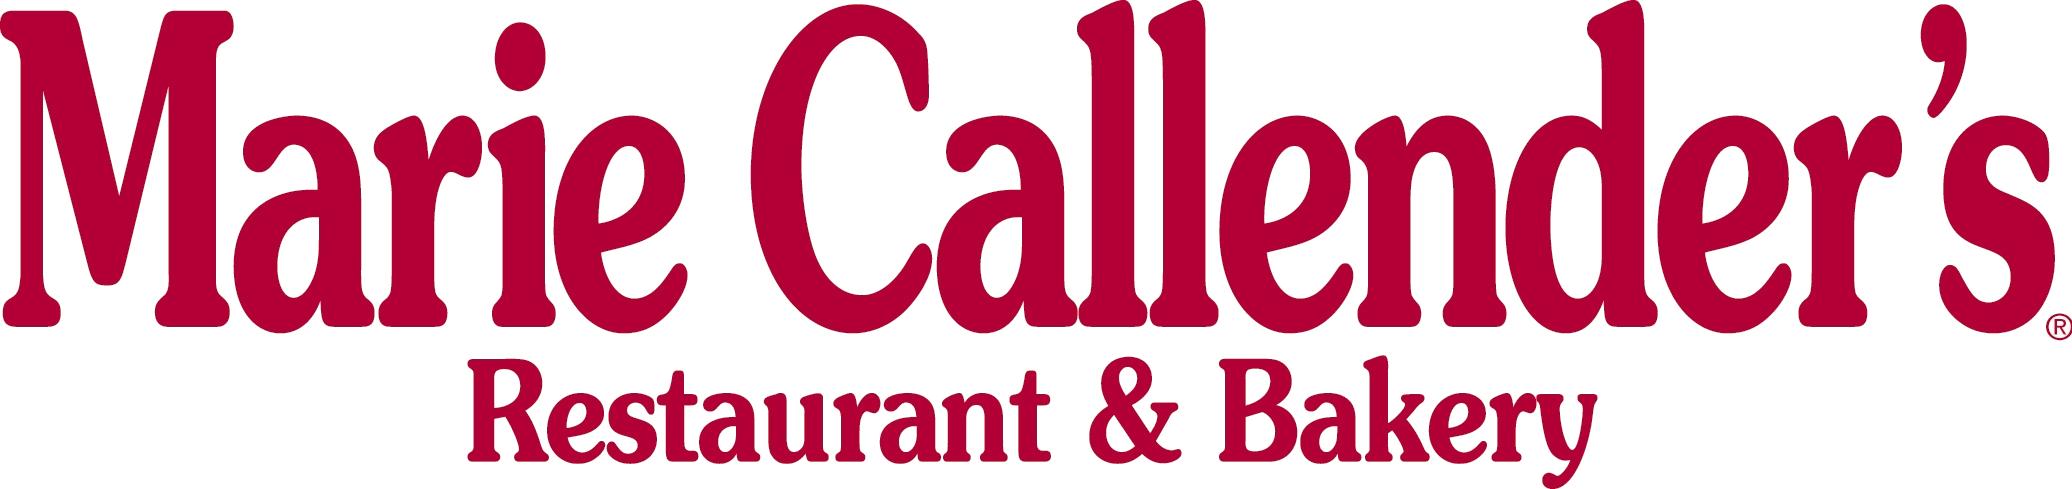 Marie Callender_s Logo